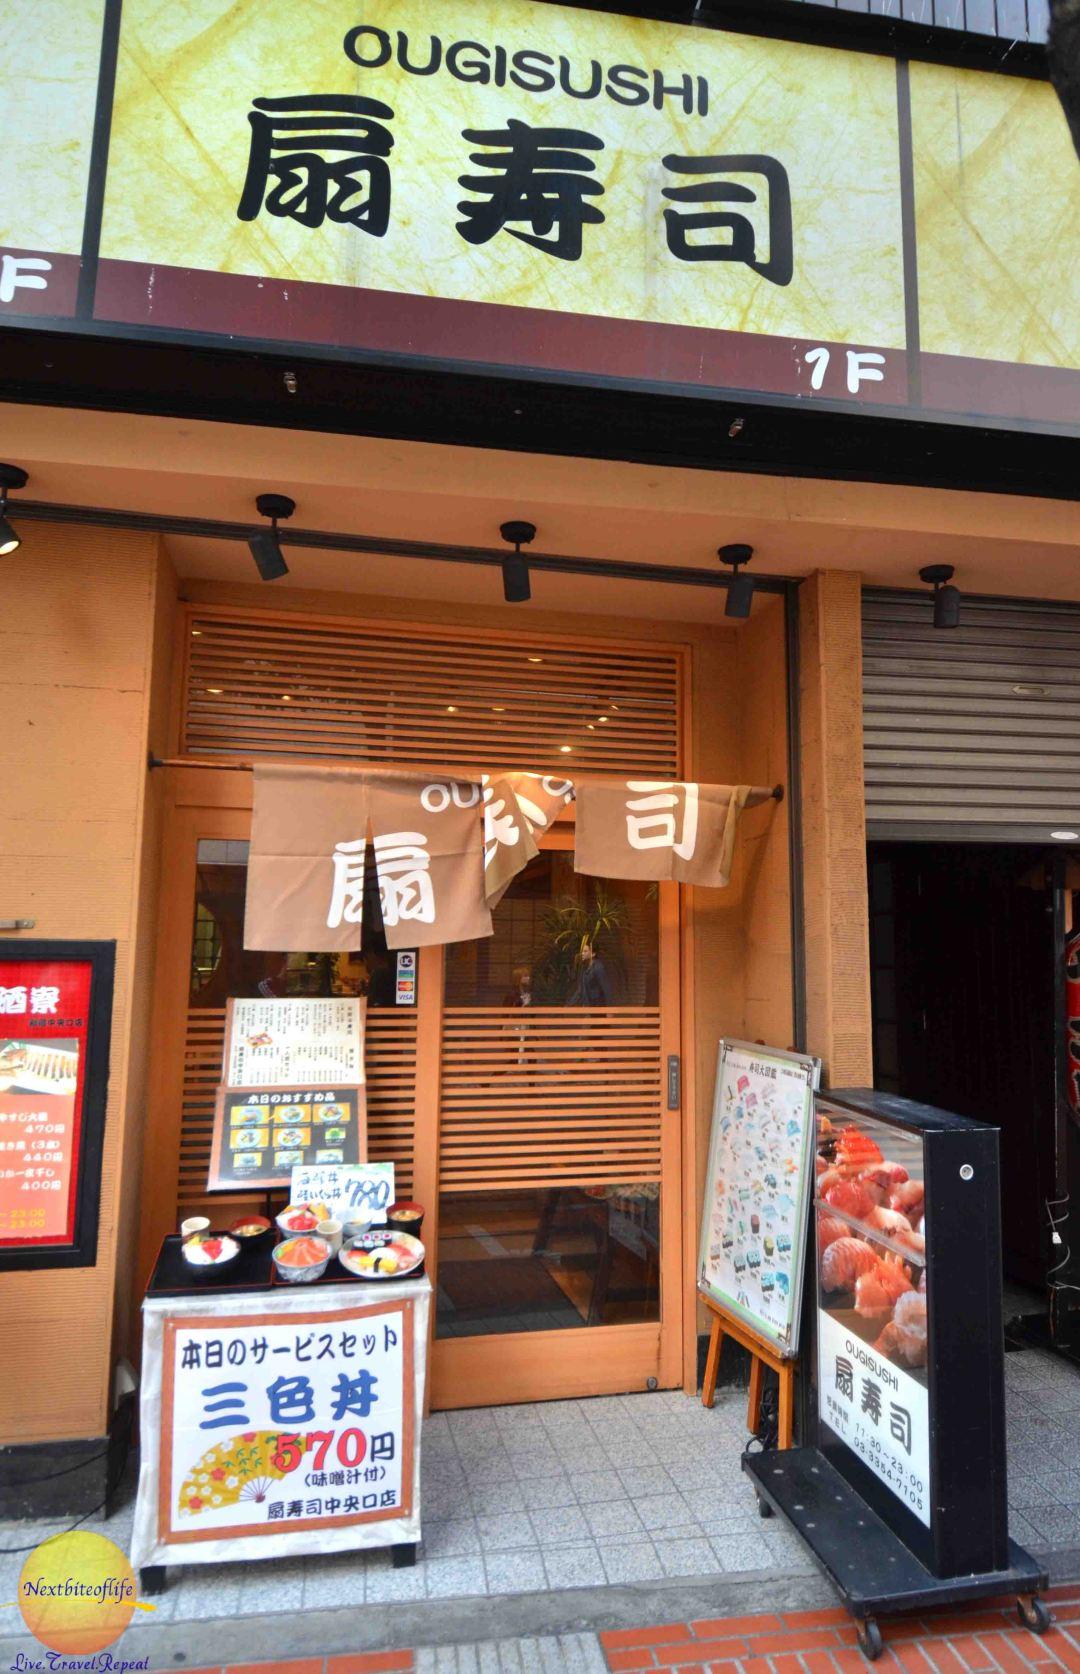 foodies in Japan ougisushi